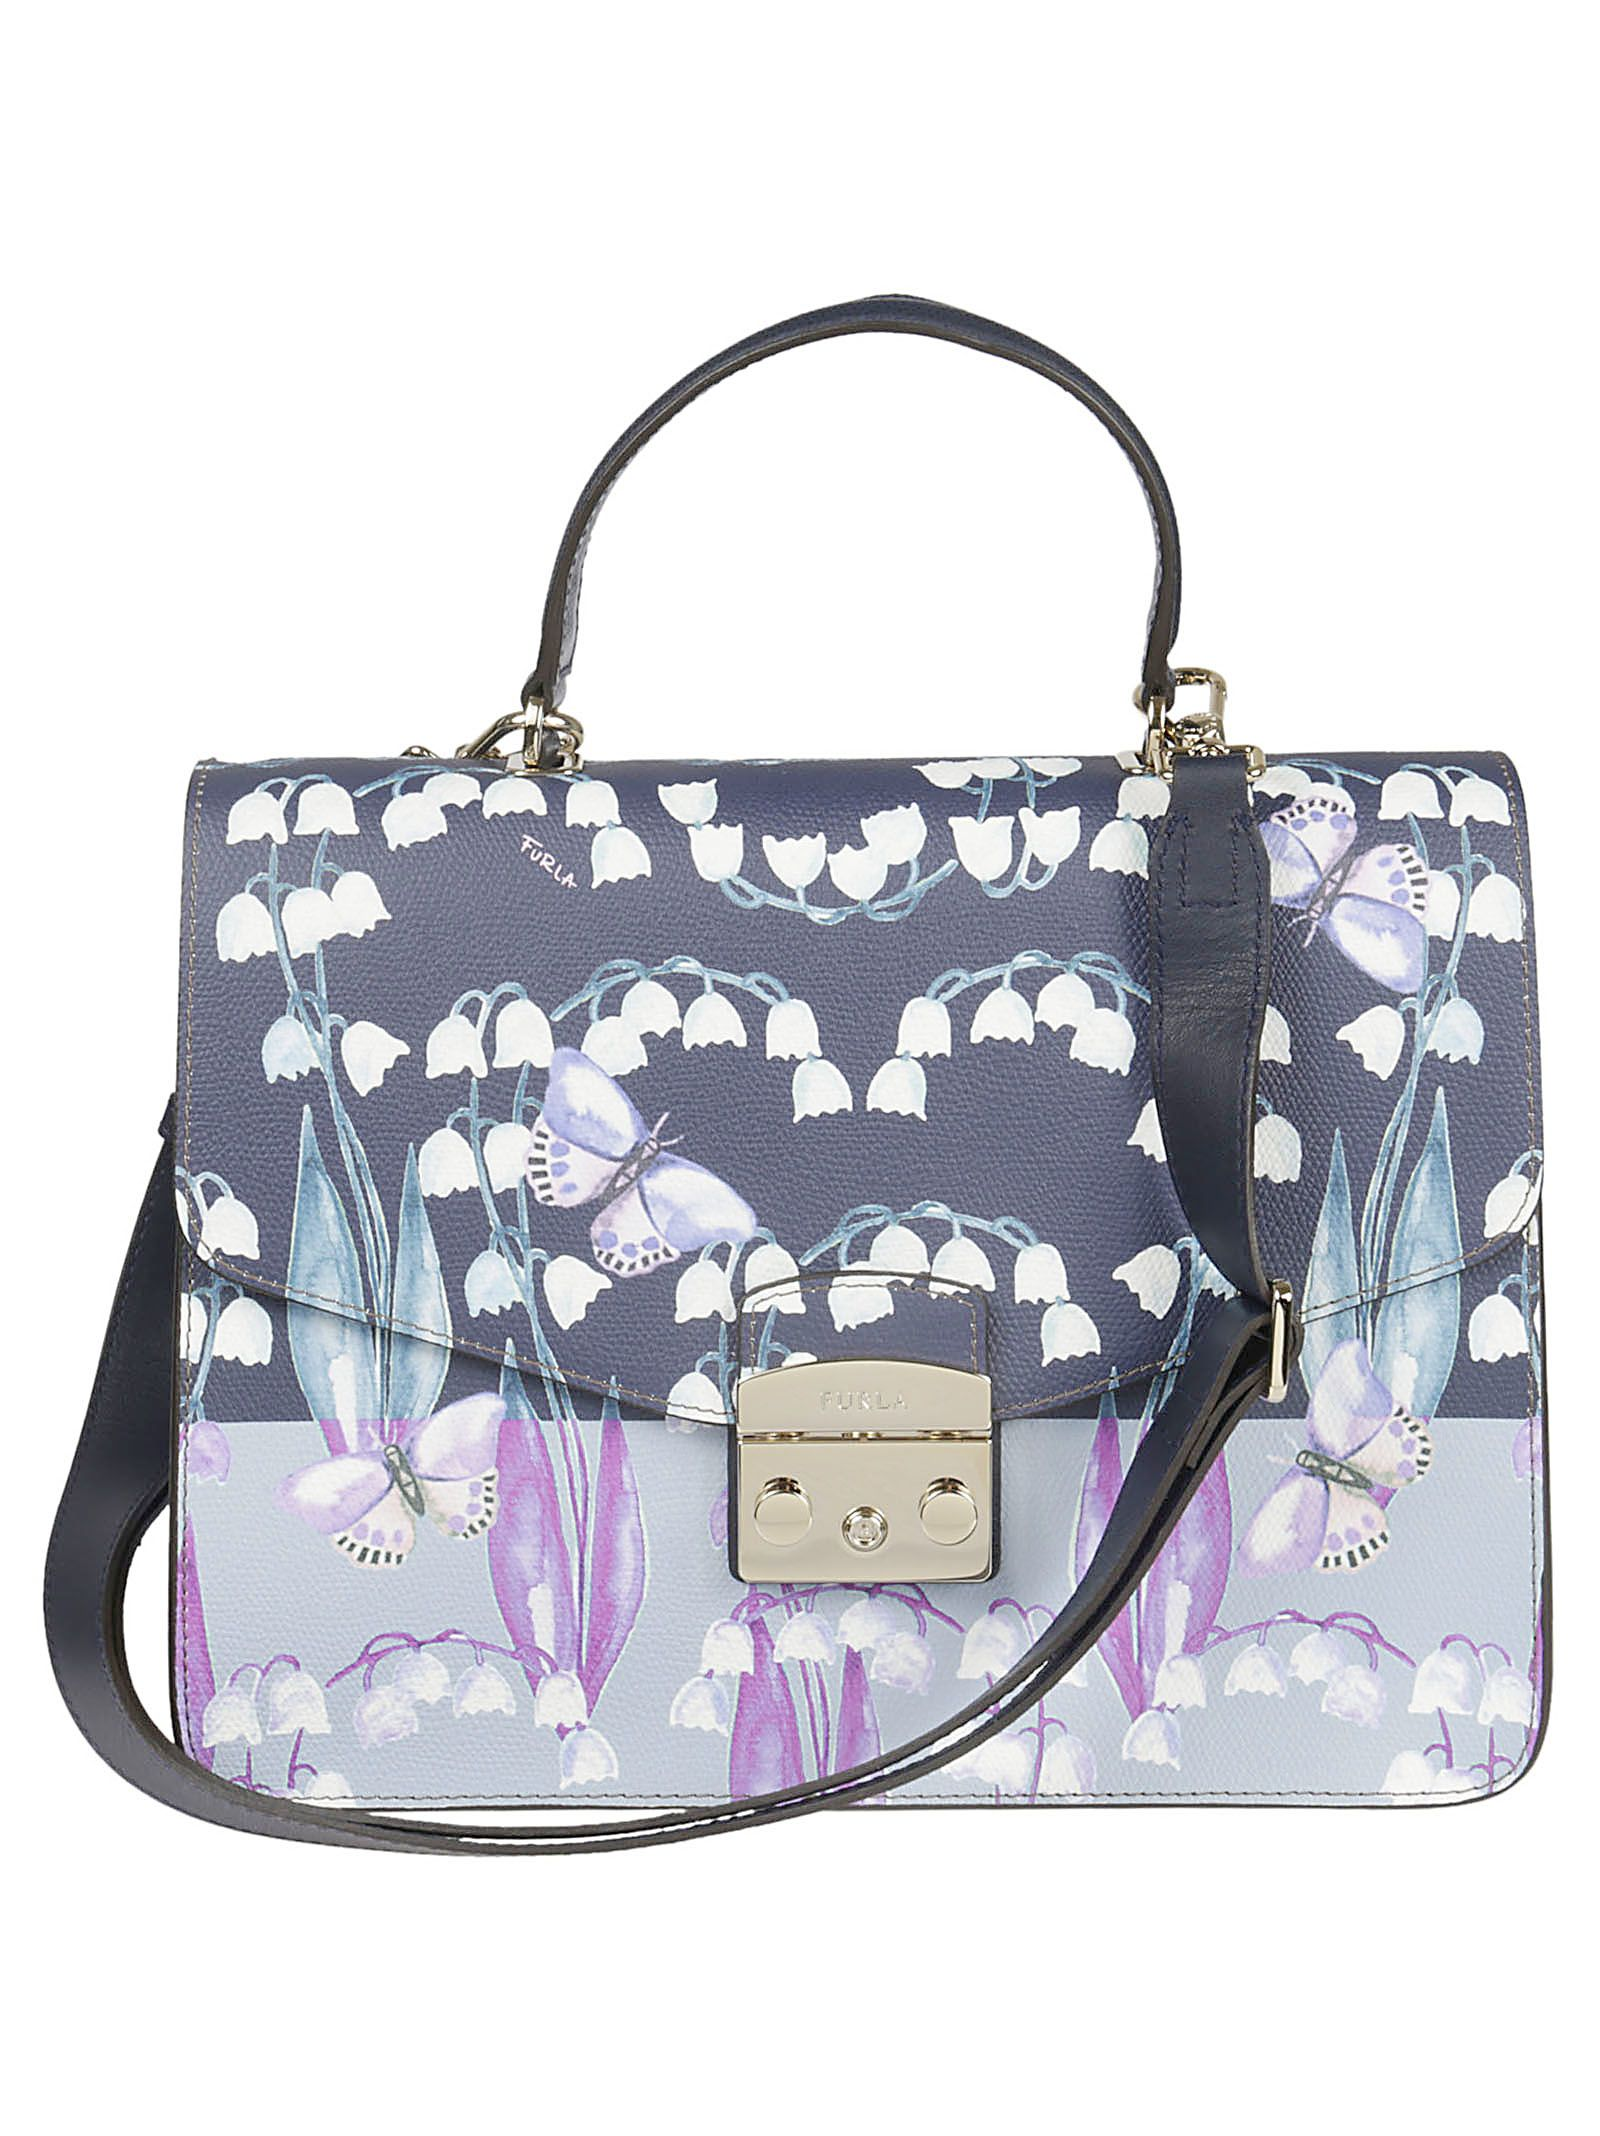 Furla Butterfly Metropolis Shoulder Bag